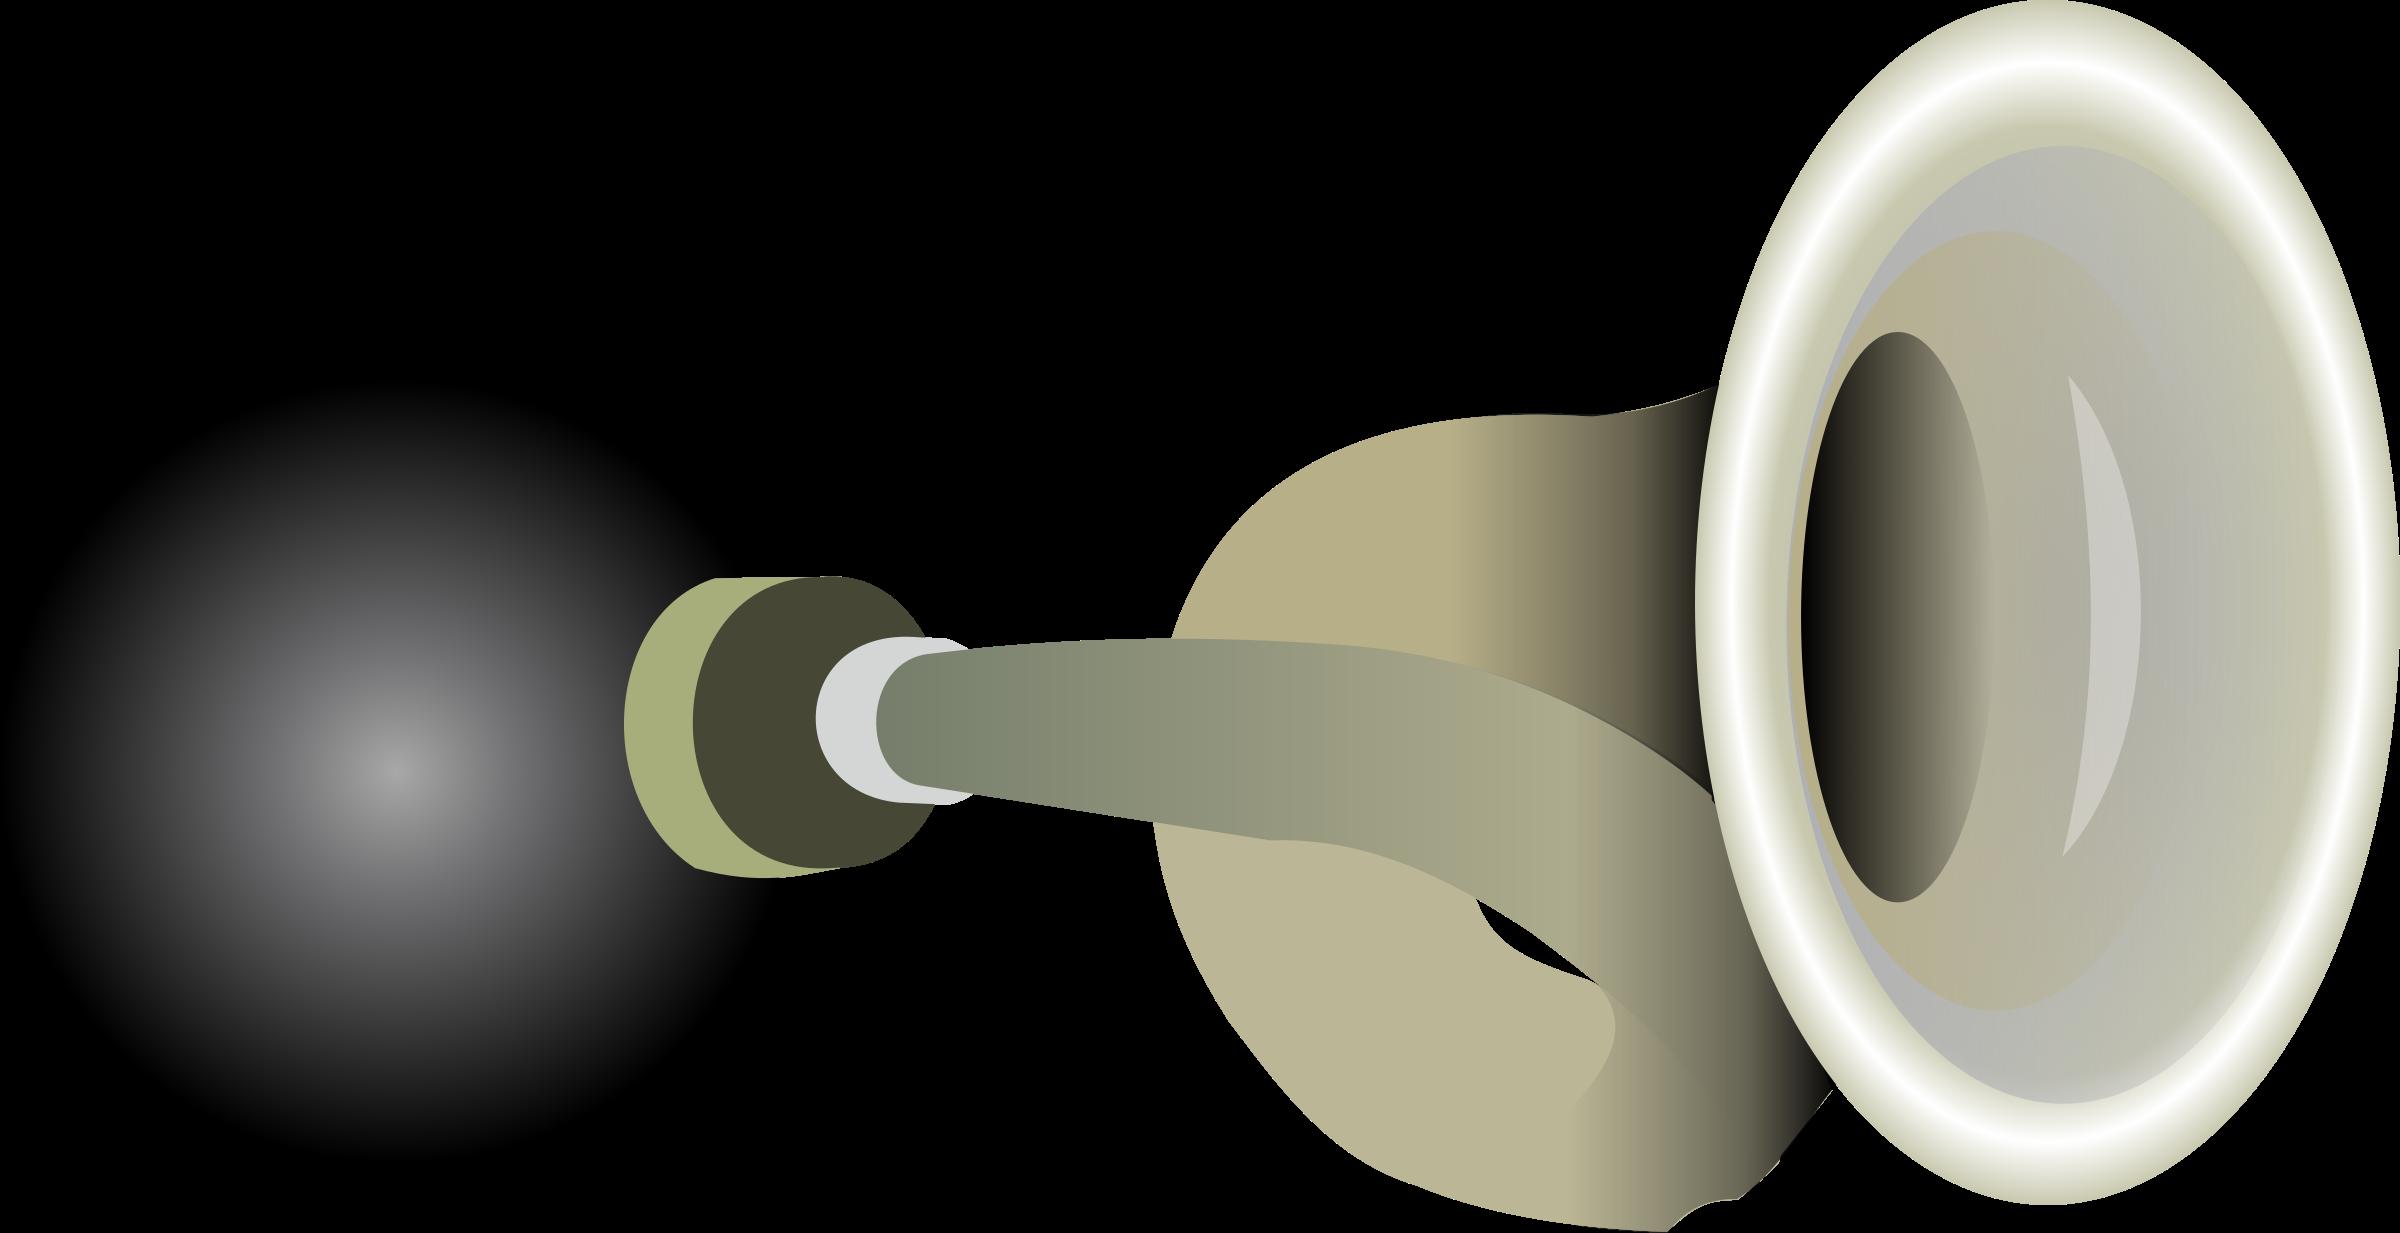 Bike Horn Clipart.